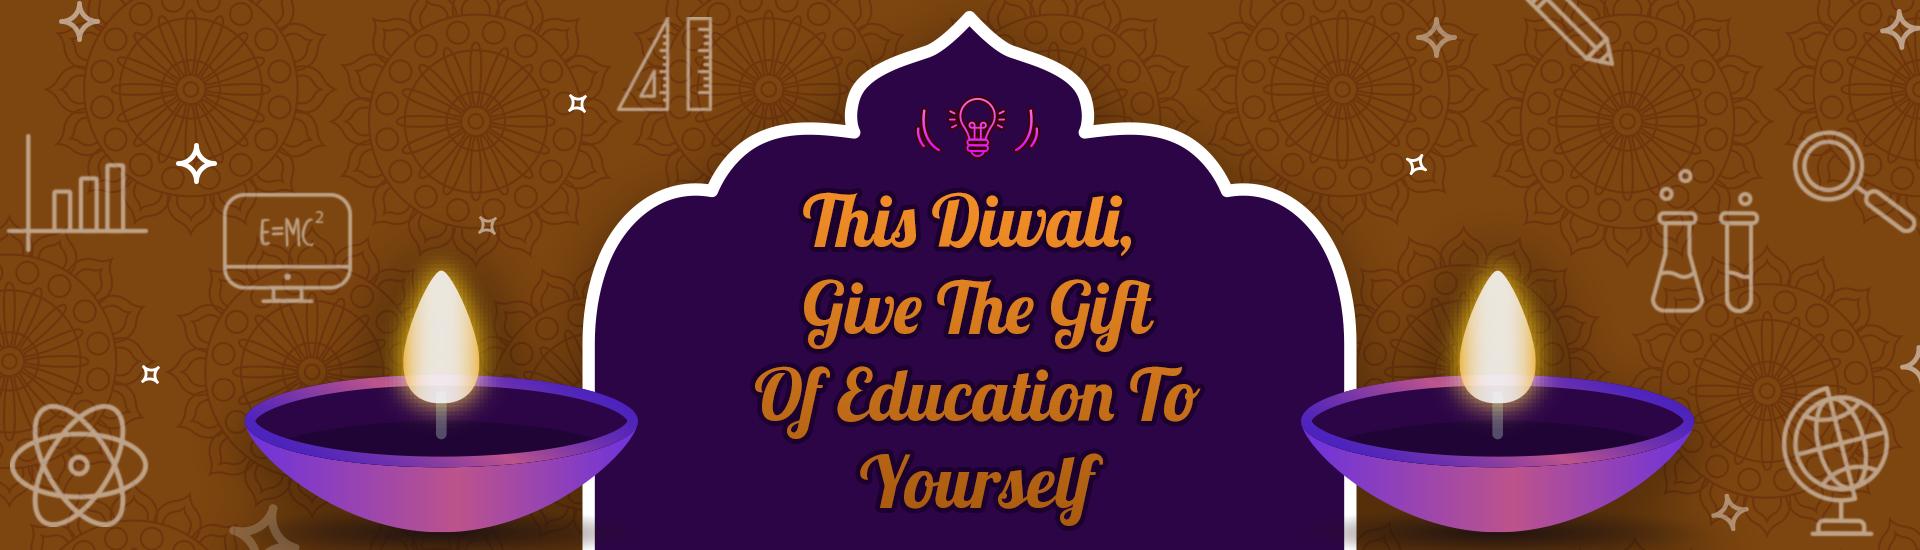 Happy Diwali Festival 2019 Image